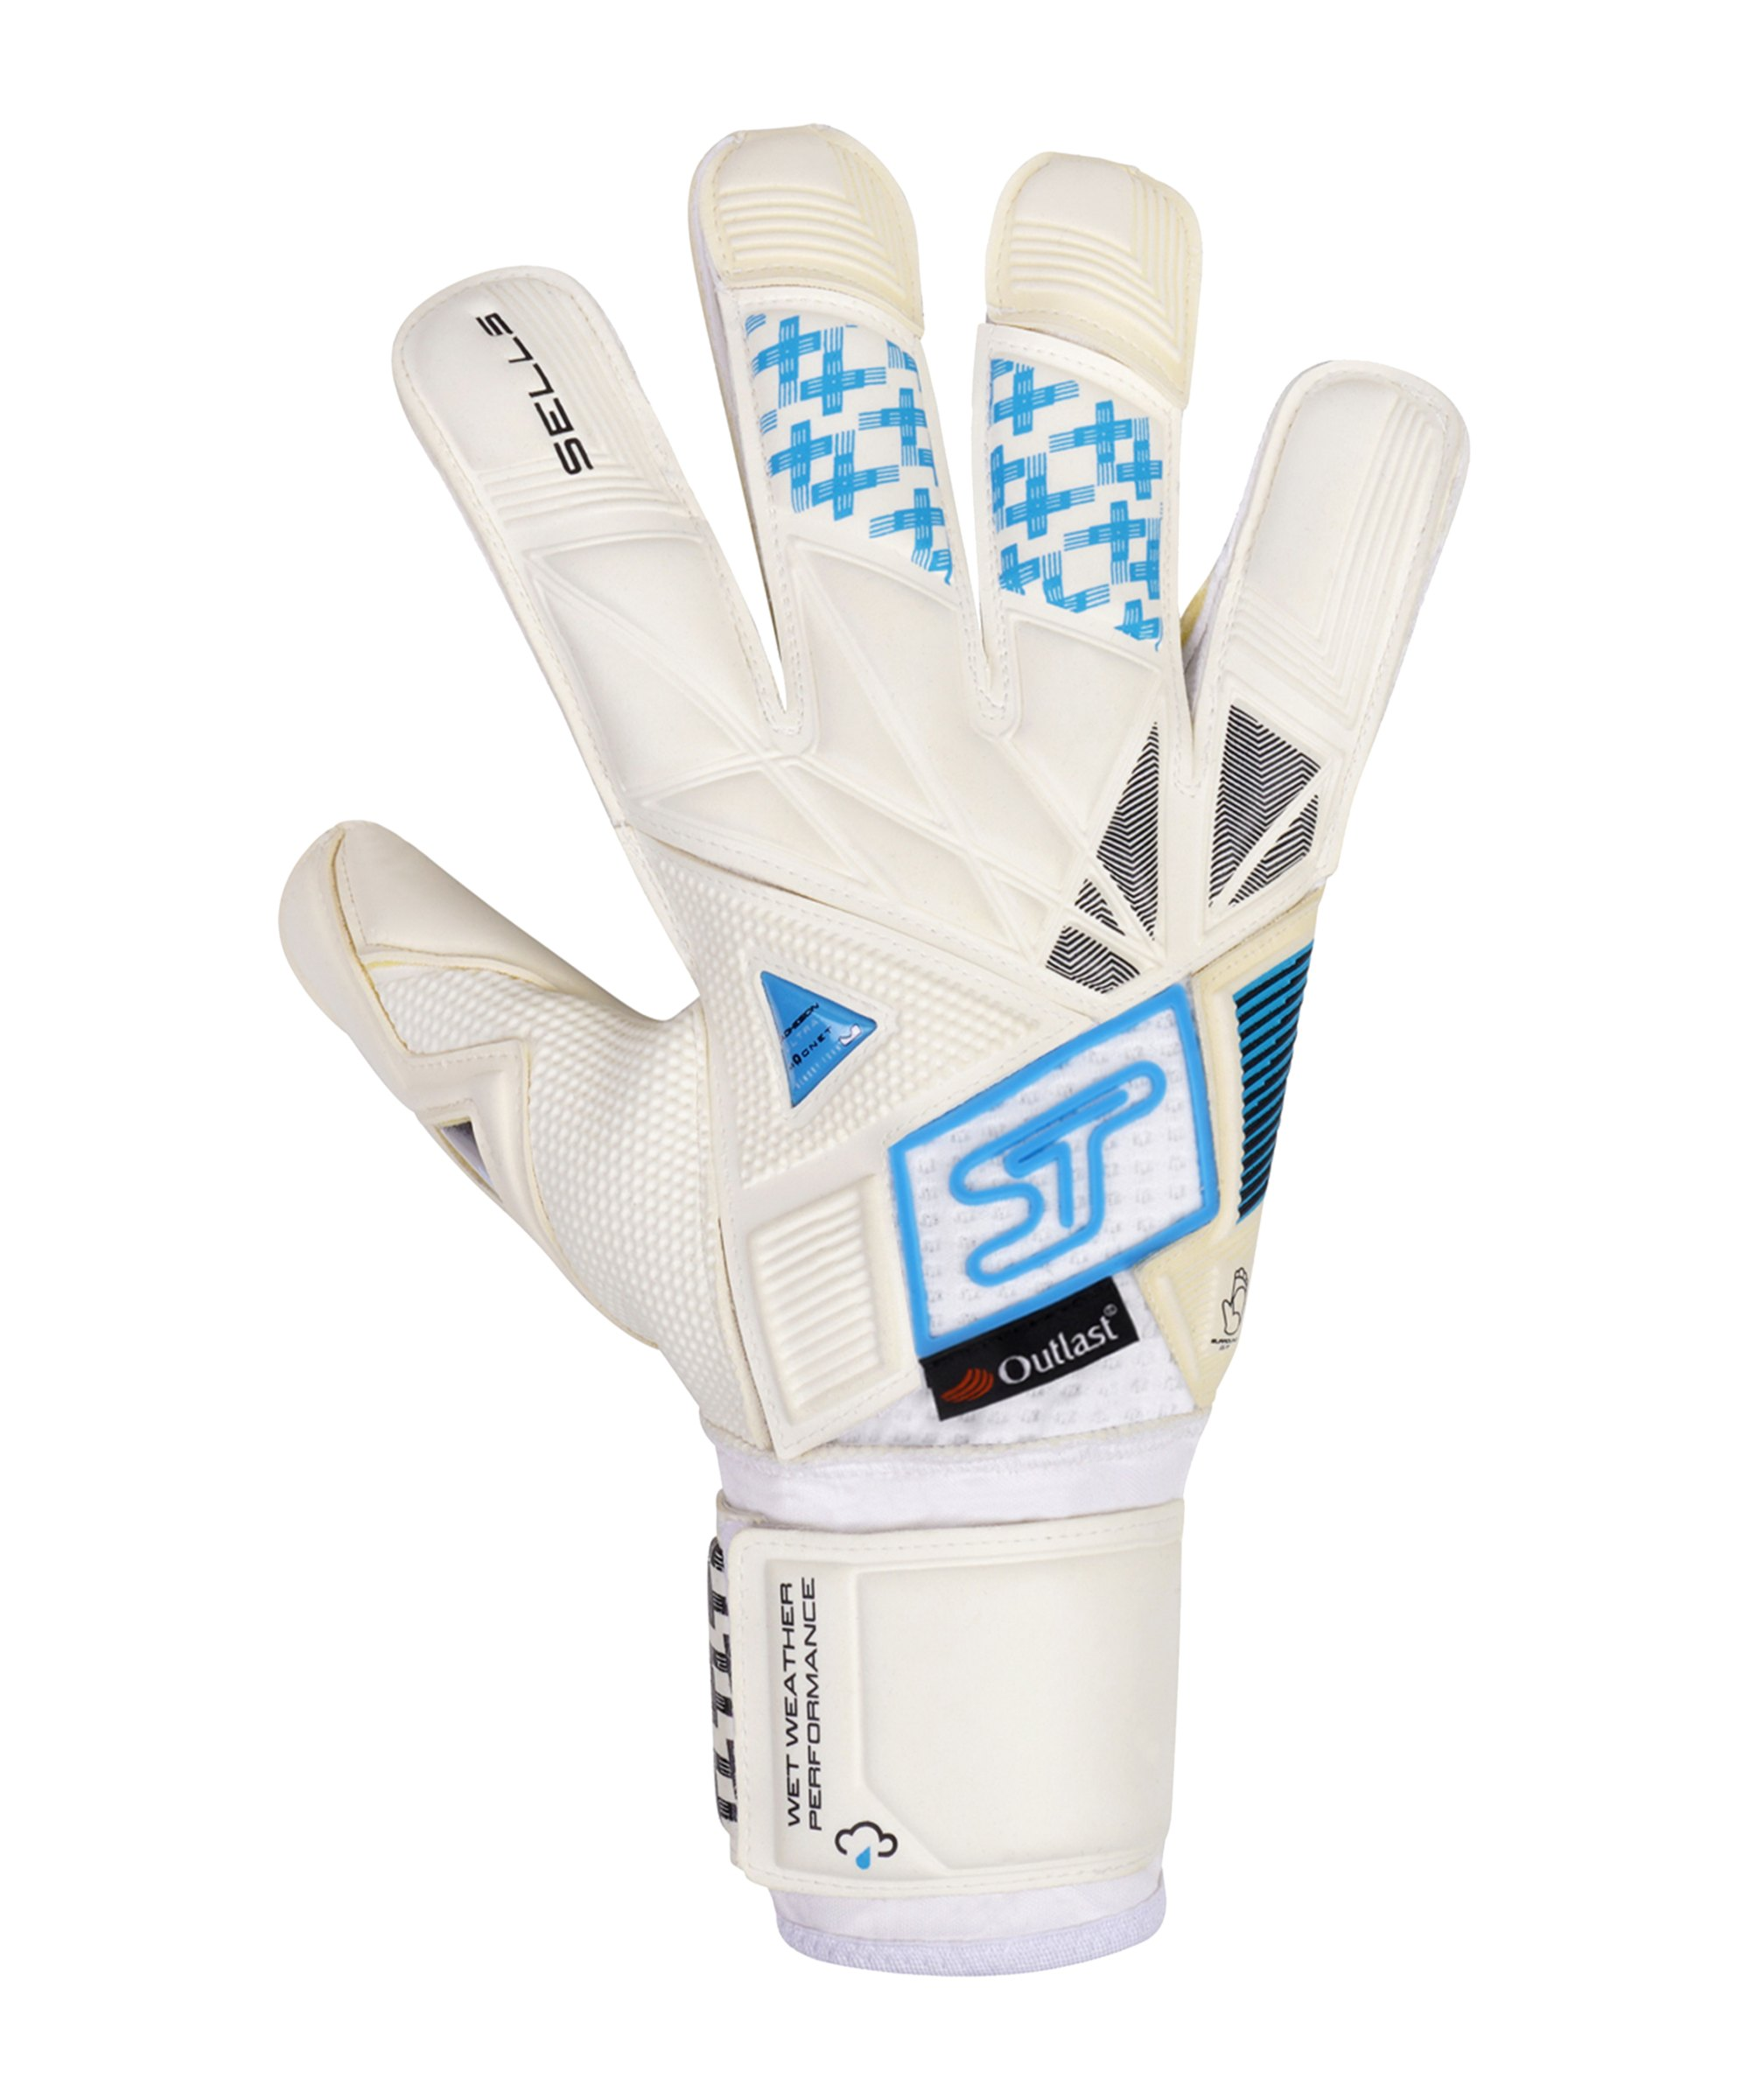 Sells Revolve Ultimate TW-Handschuh Weiss Schwarz Blau - weiss